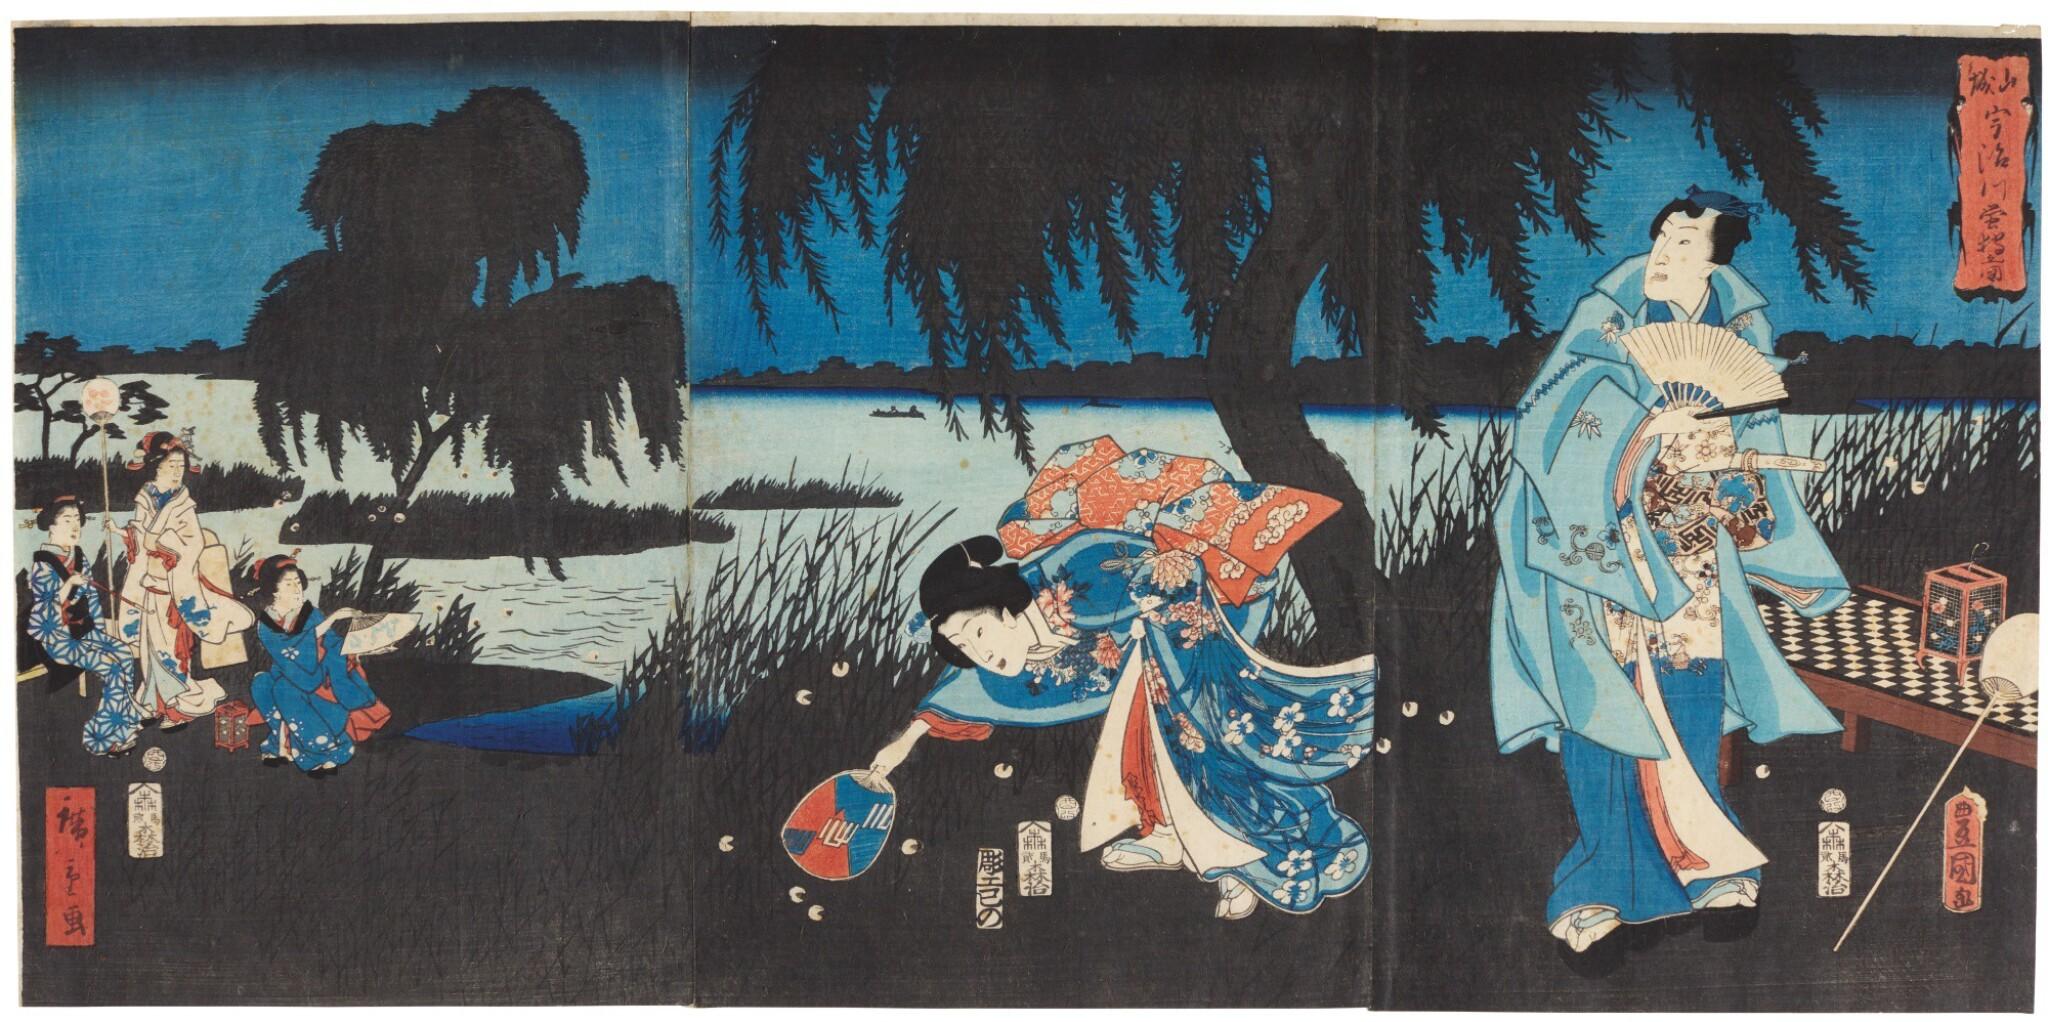 UTAGAWA HIROSHIGE I (1786–1865), EDO PERIOD, 19TH CENTURY   GENJI CATCHING FIREFLIES